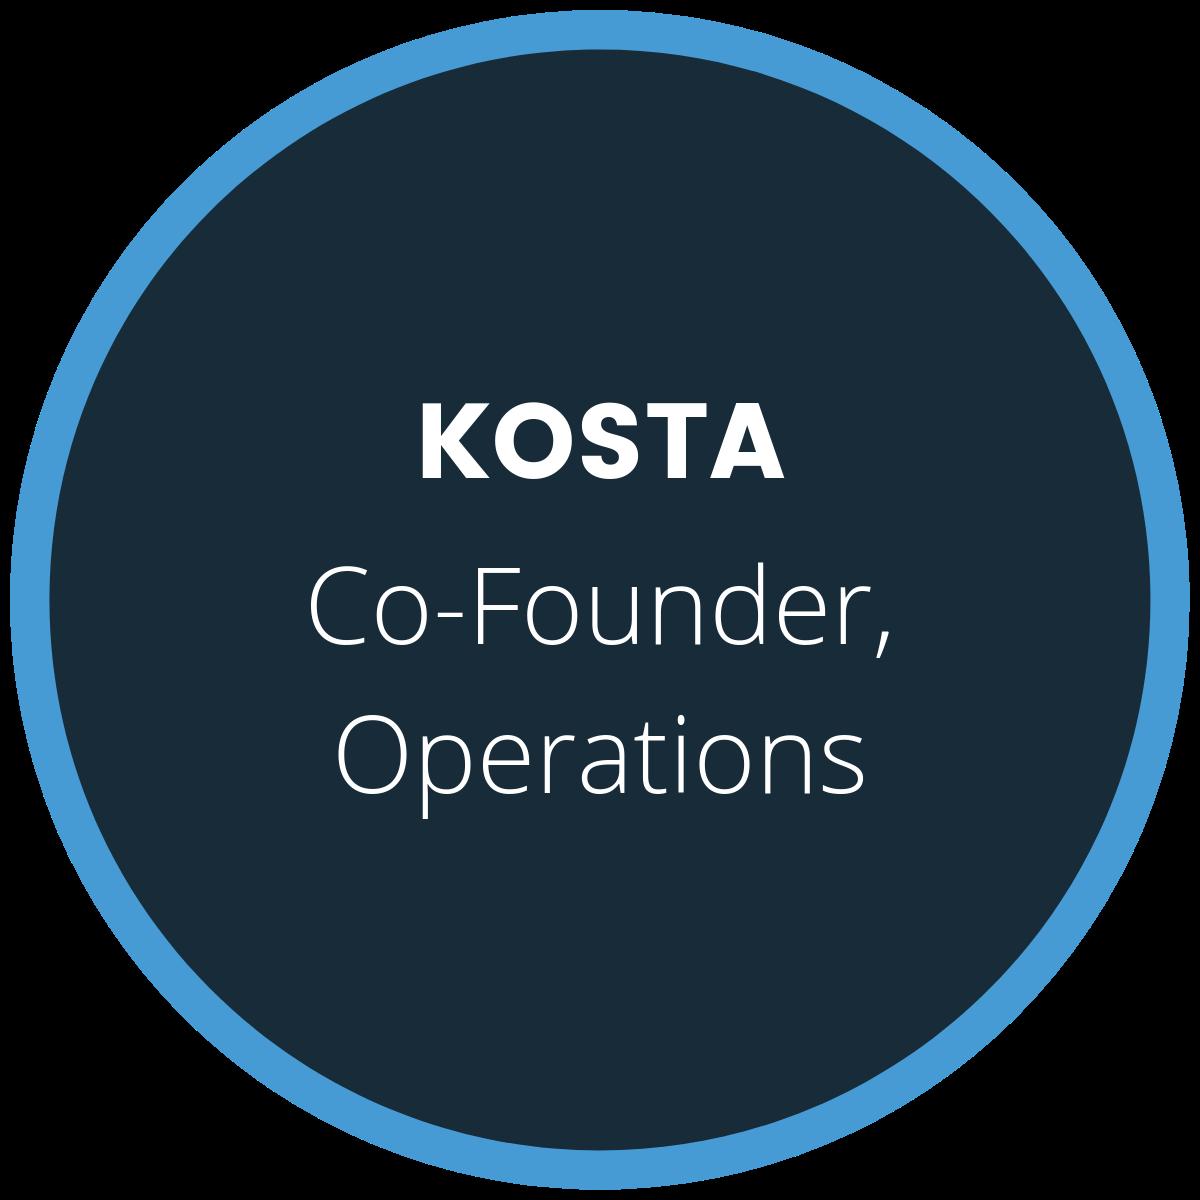 kosta-web4realty